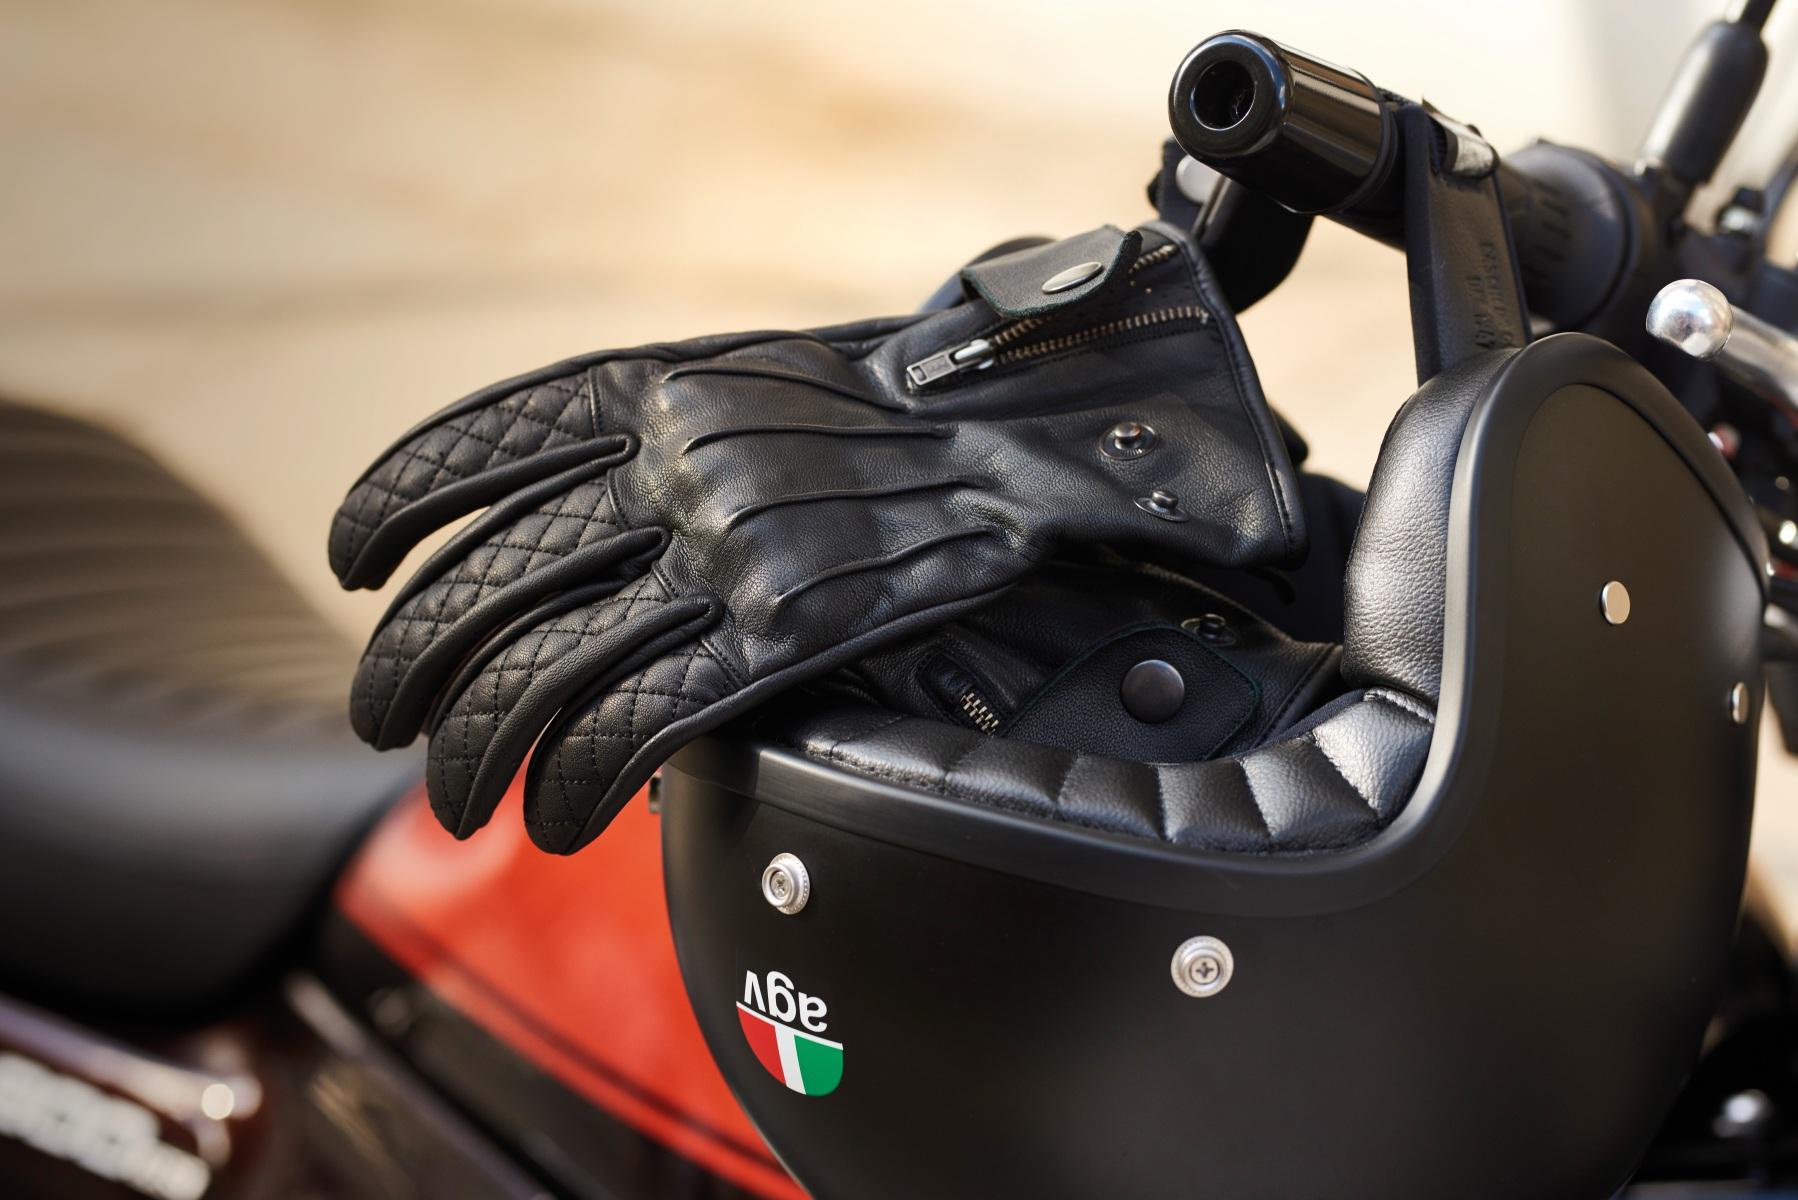 102405-rst-matlock-leahter-glove-black-lifestyle-01